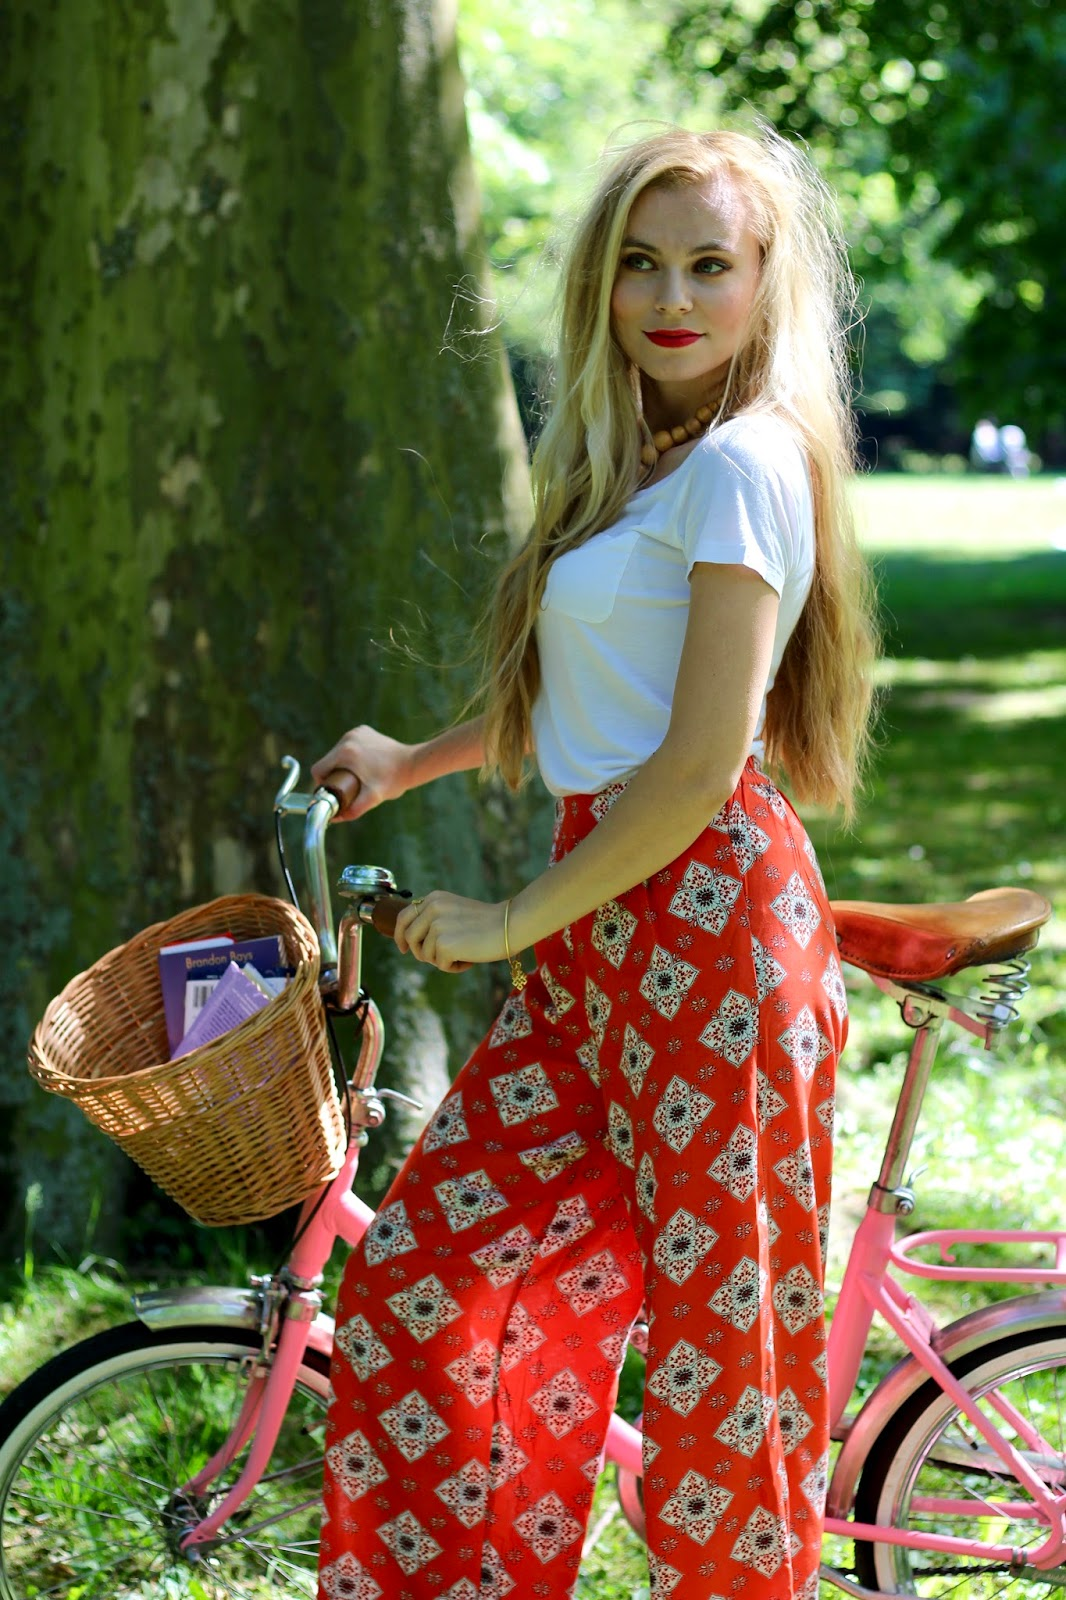 retro bike, outfit